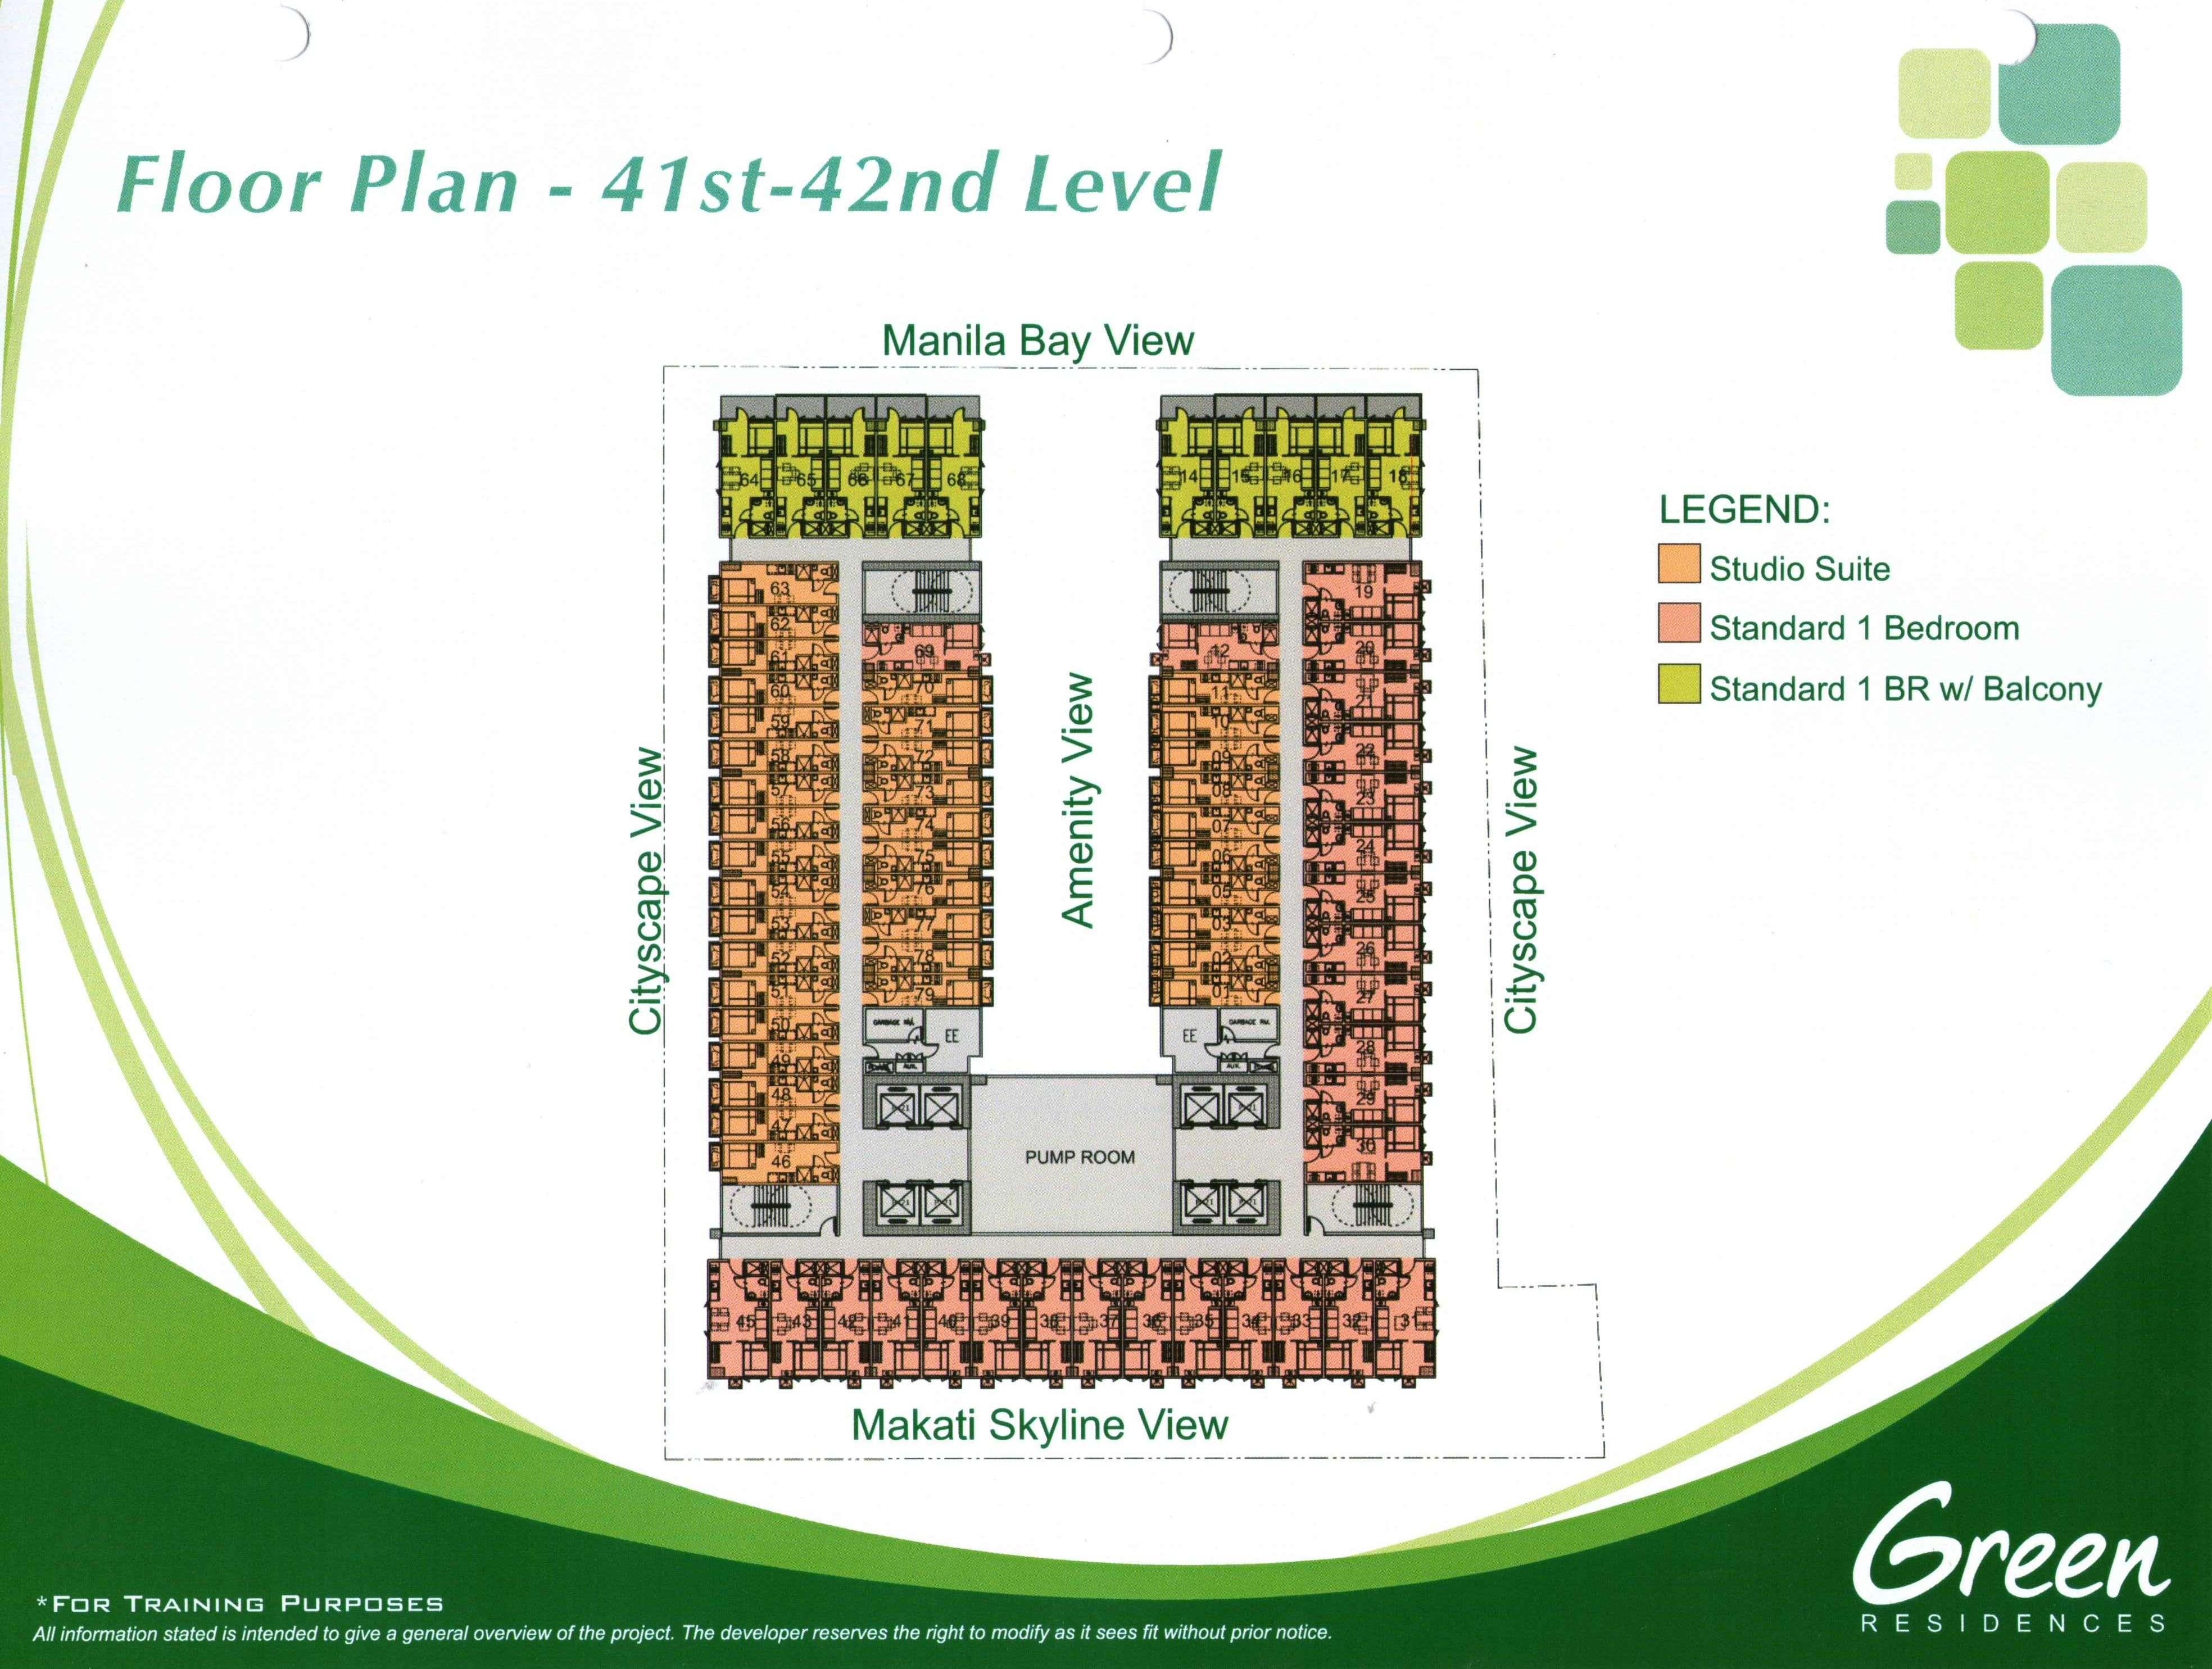 Green Residences Floor Plan